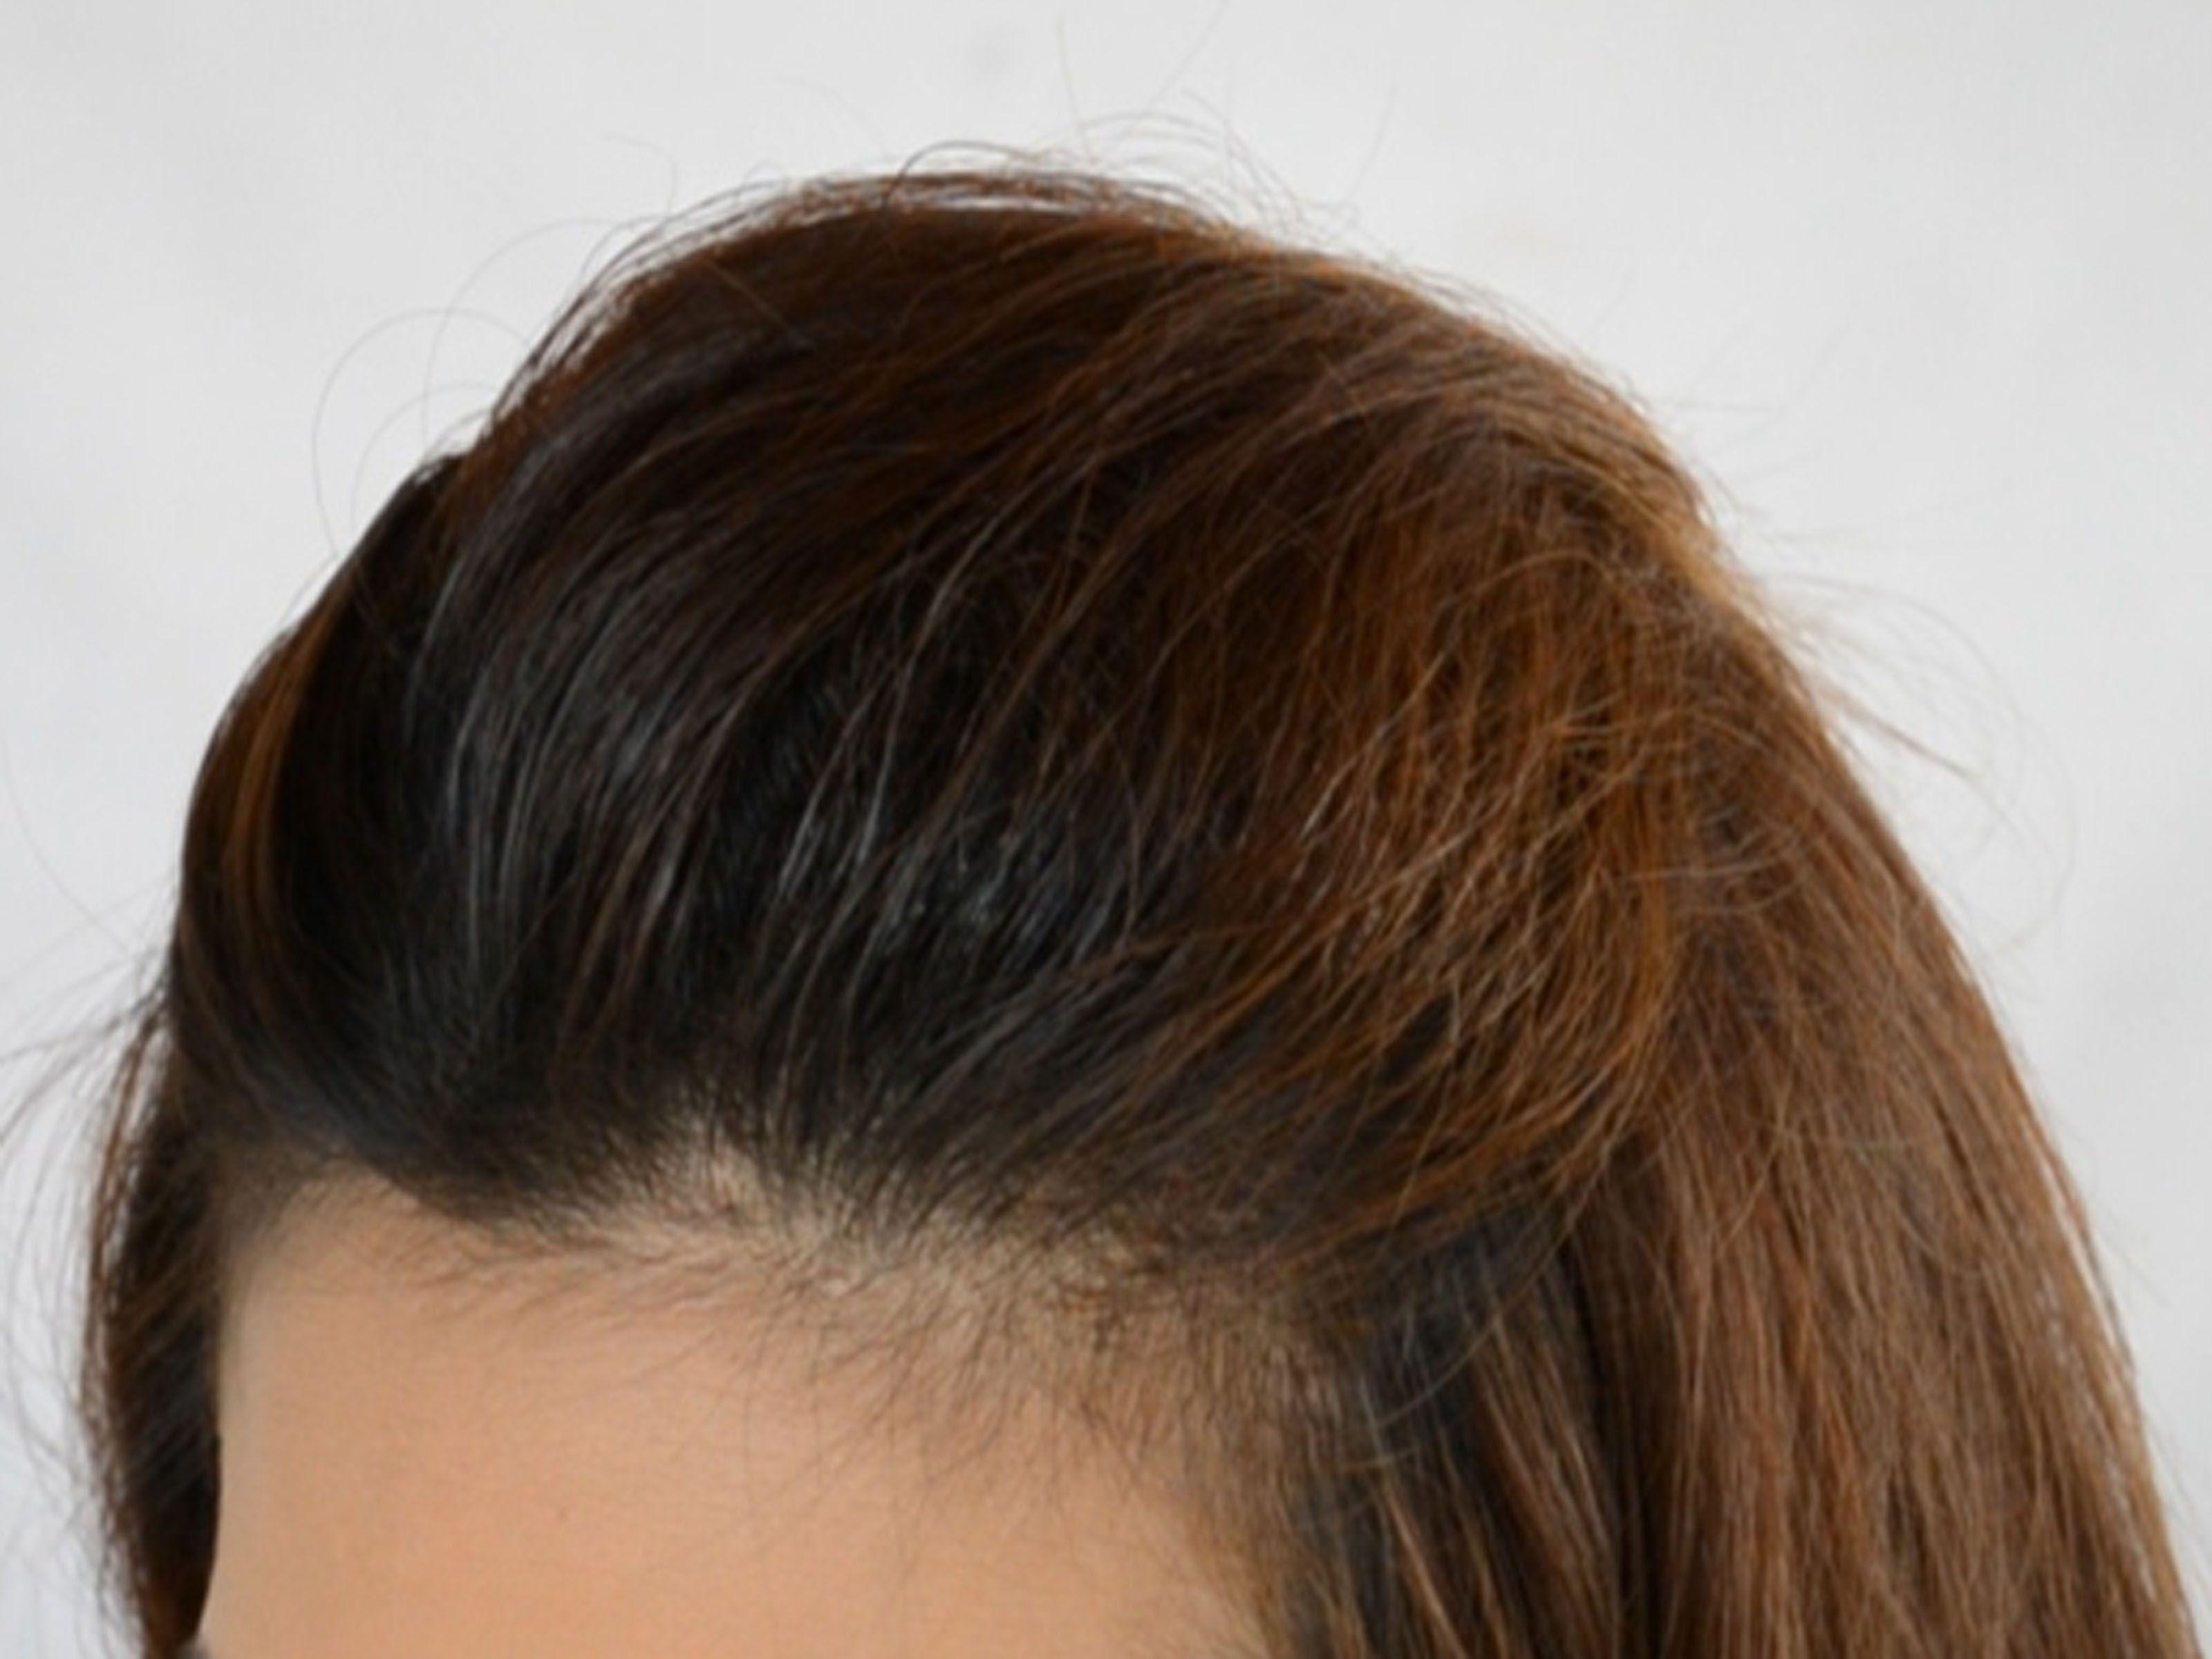 Volumed Hair For Fine Hair Tips Hair Styles How To Backcomb Hair Bump Hairstyles